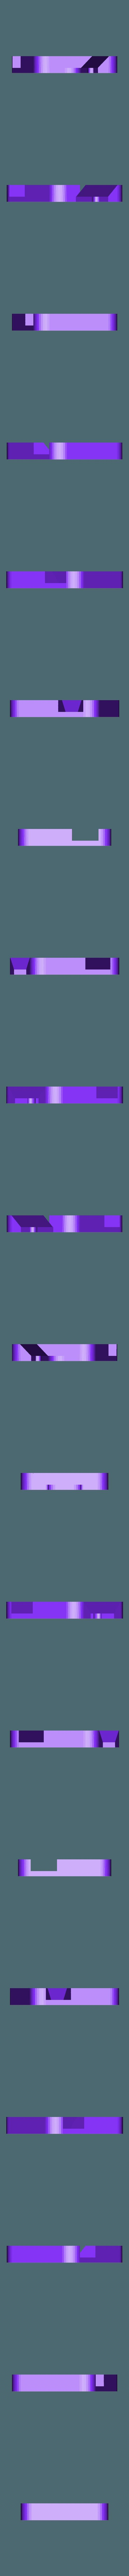 clips-film_Visor_frame_EUROPE_ISO838-1mm_front.stl Download free STL file Clips for 3DVerkstan Protective Visors • Template to 3D print, Fyx